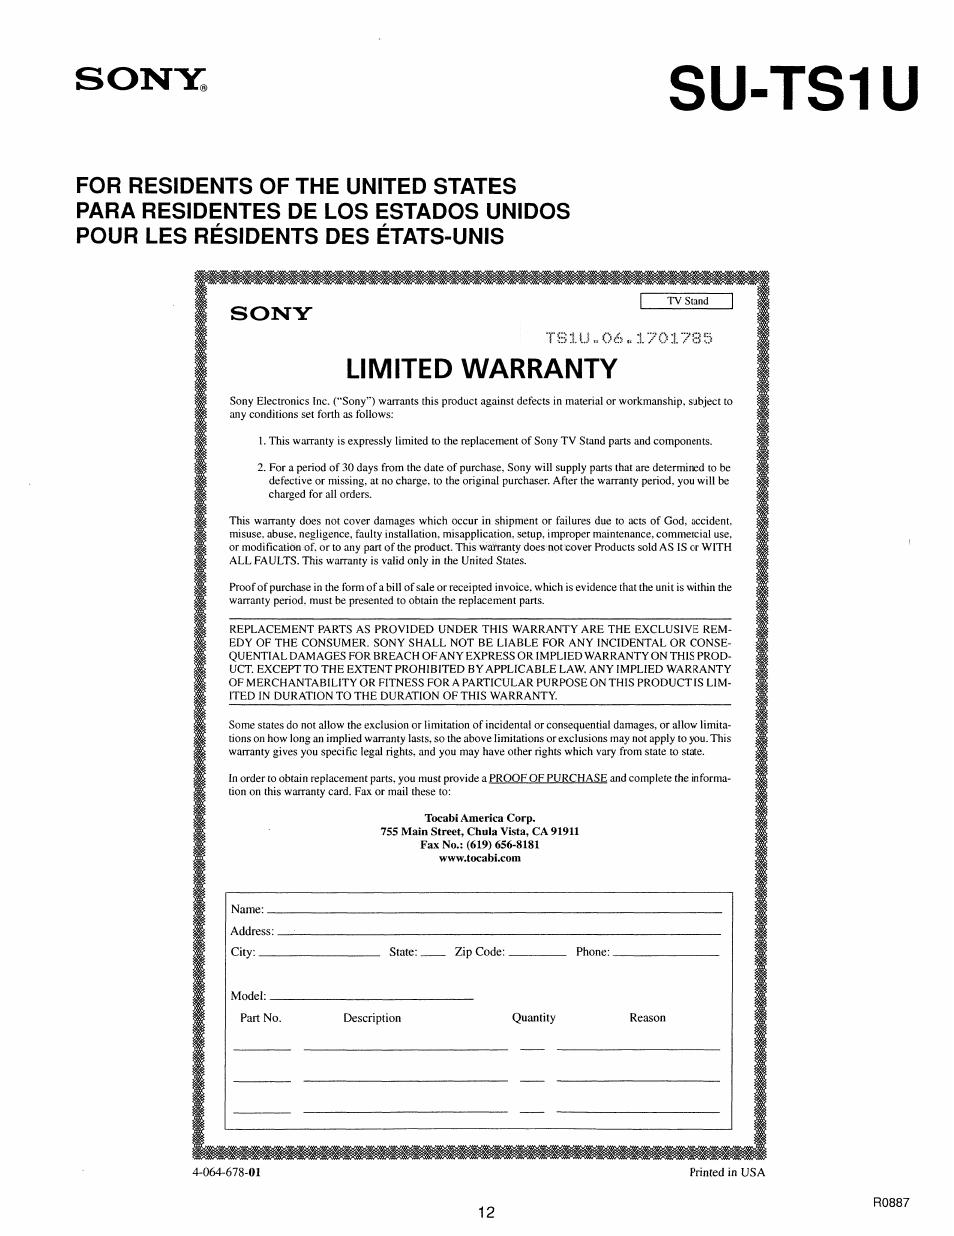 Su-ts1u, Sony, Limited warranty | Sony SU-TS1U User Manual